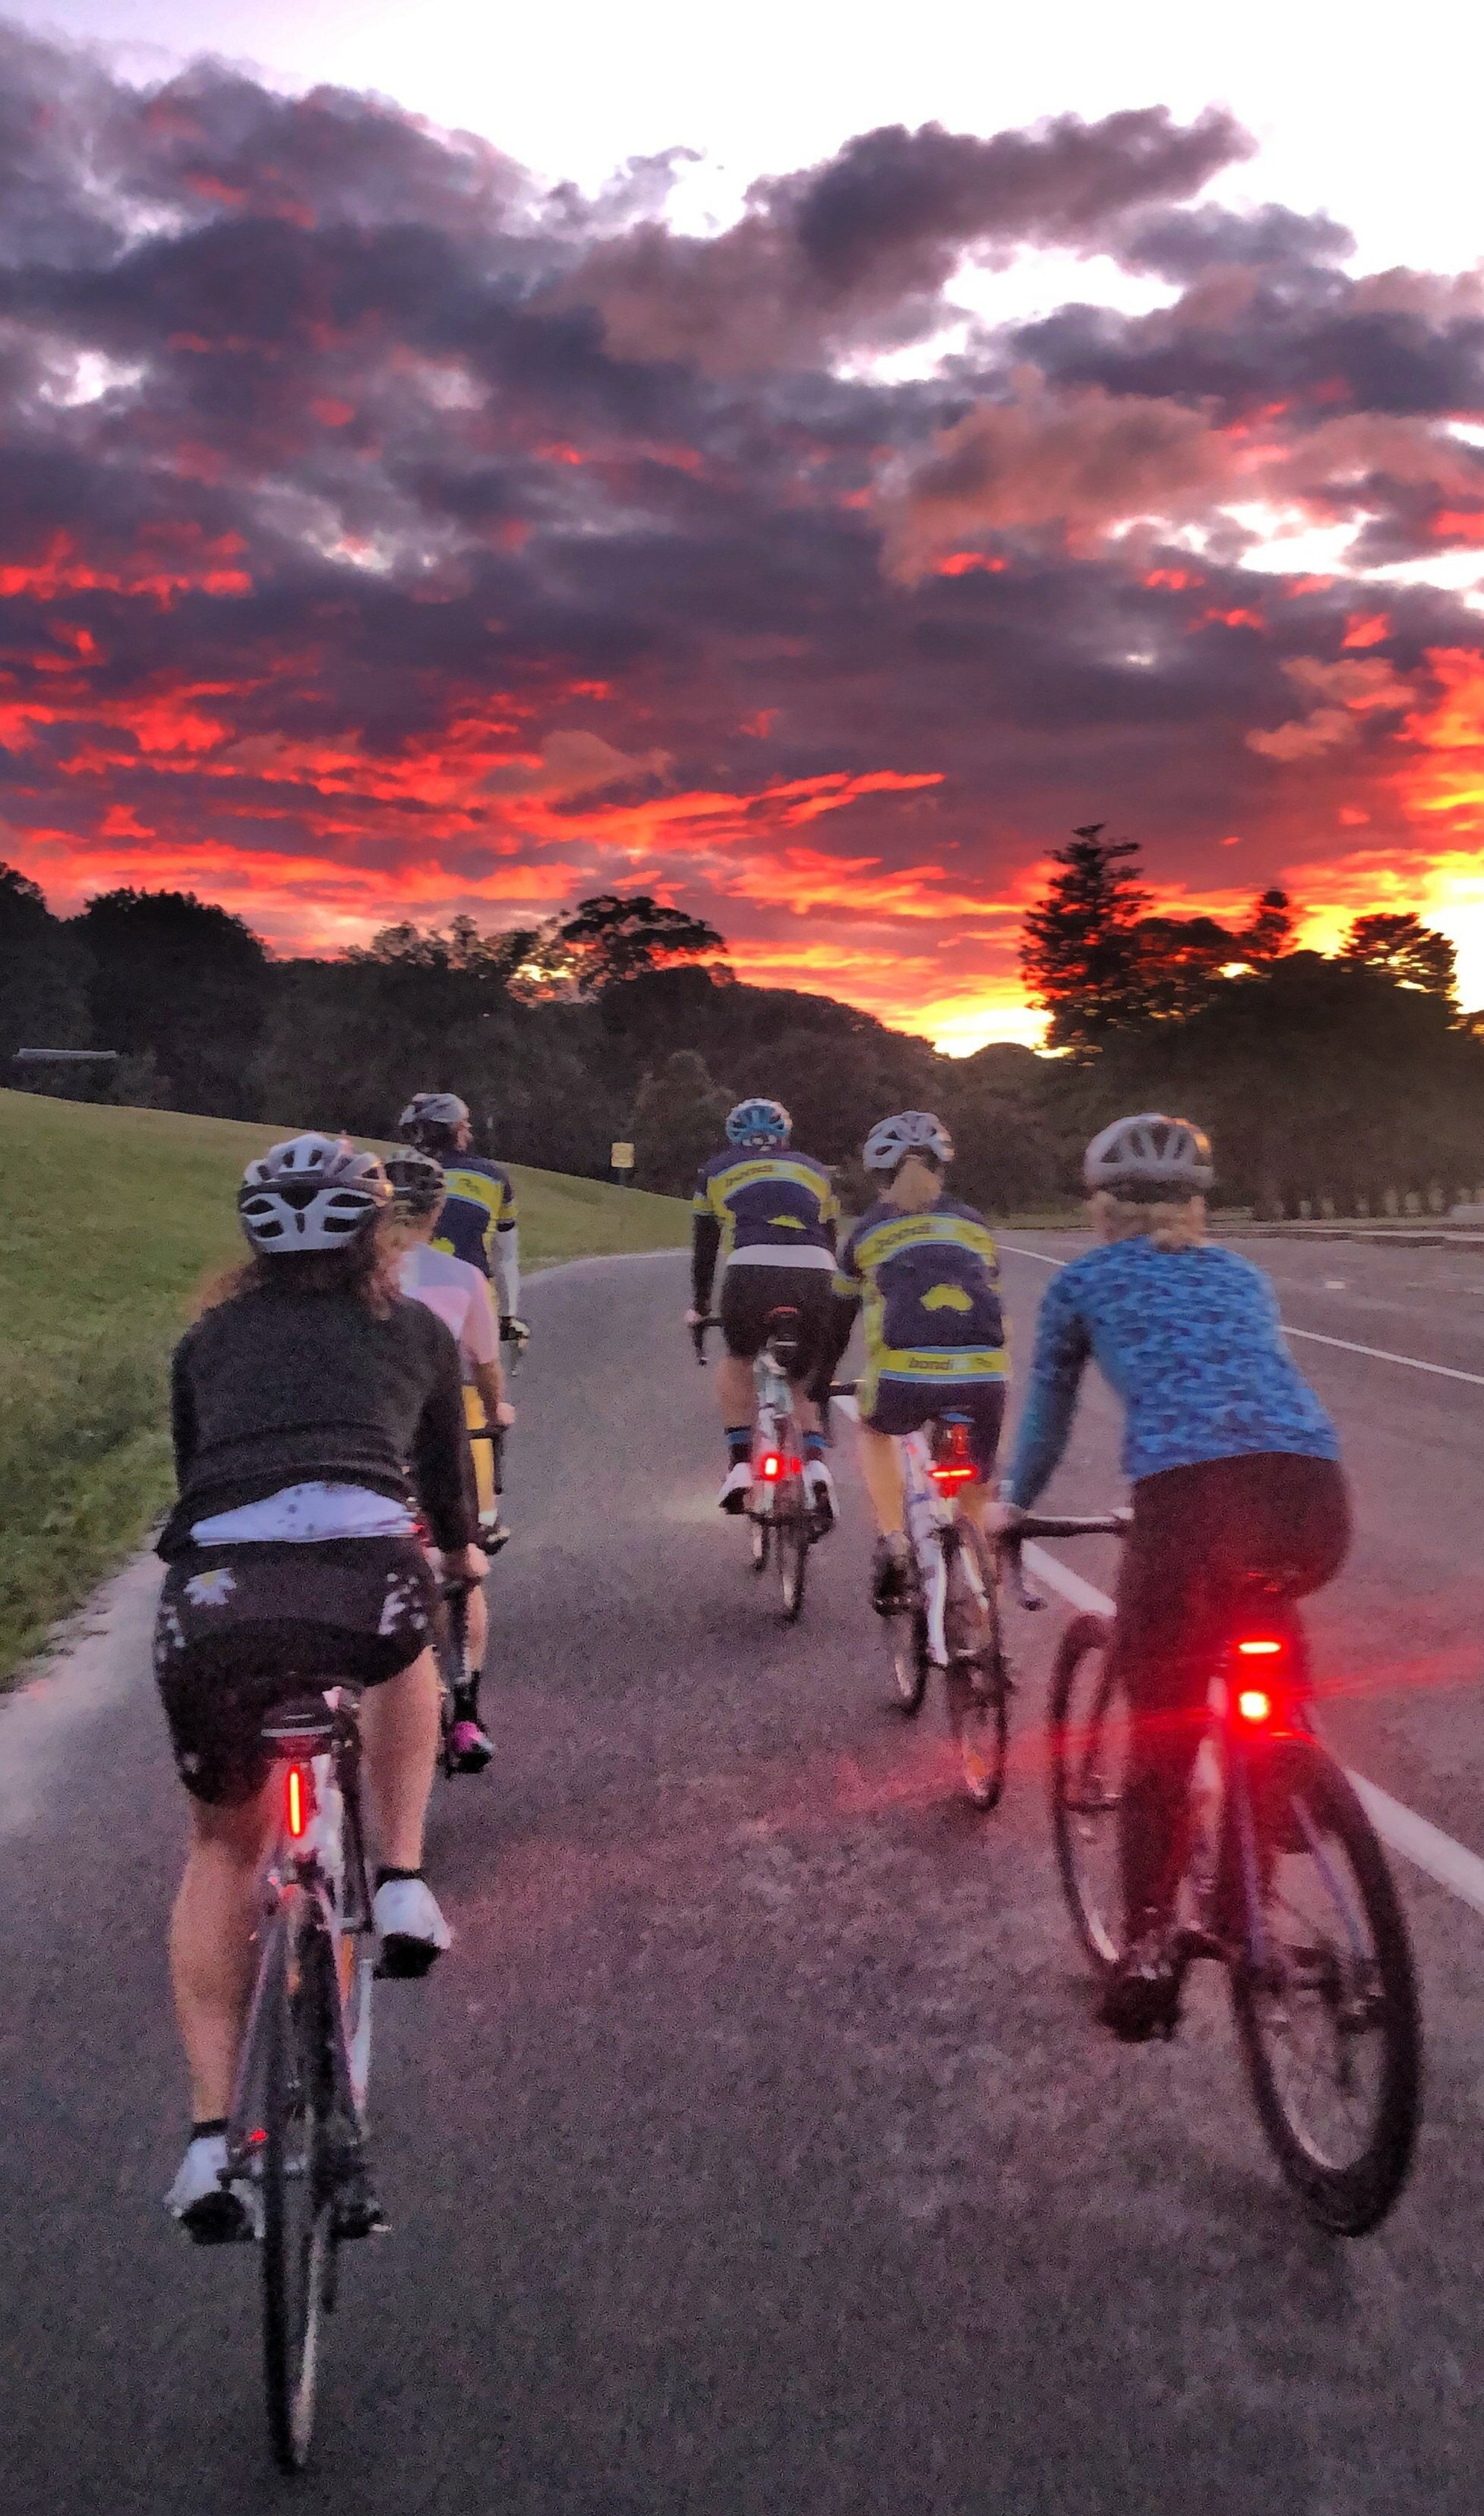 Cycle+Pack+Sunrise+CP+Oct+2019.jpg